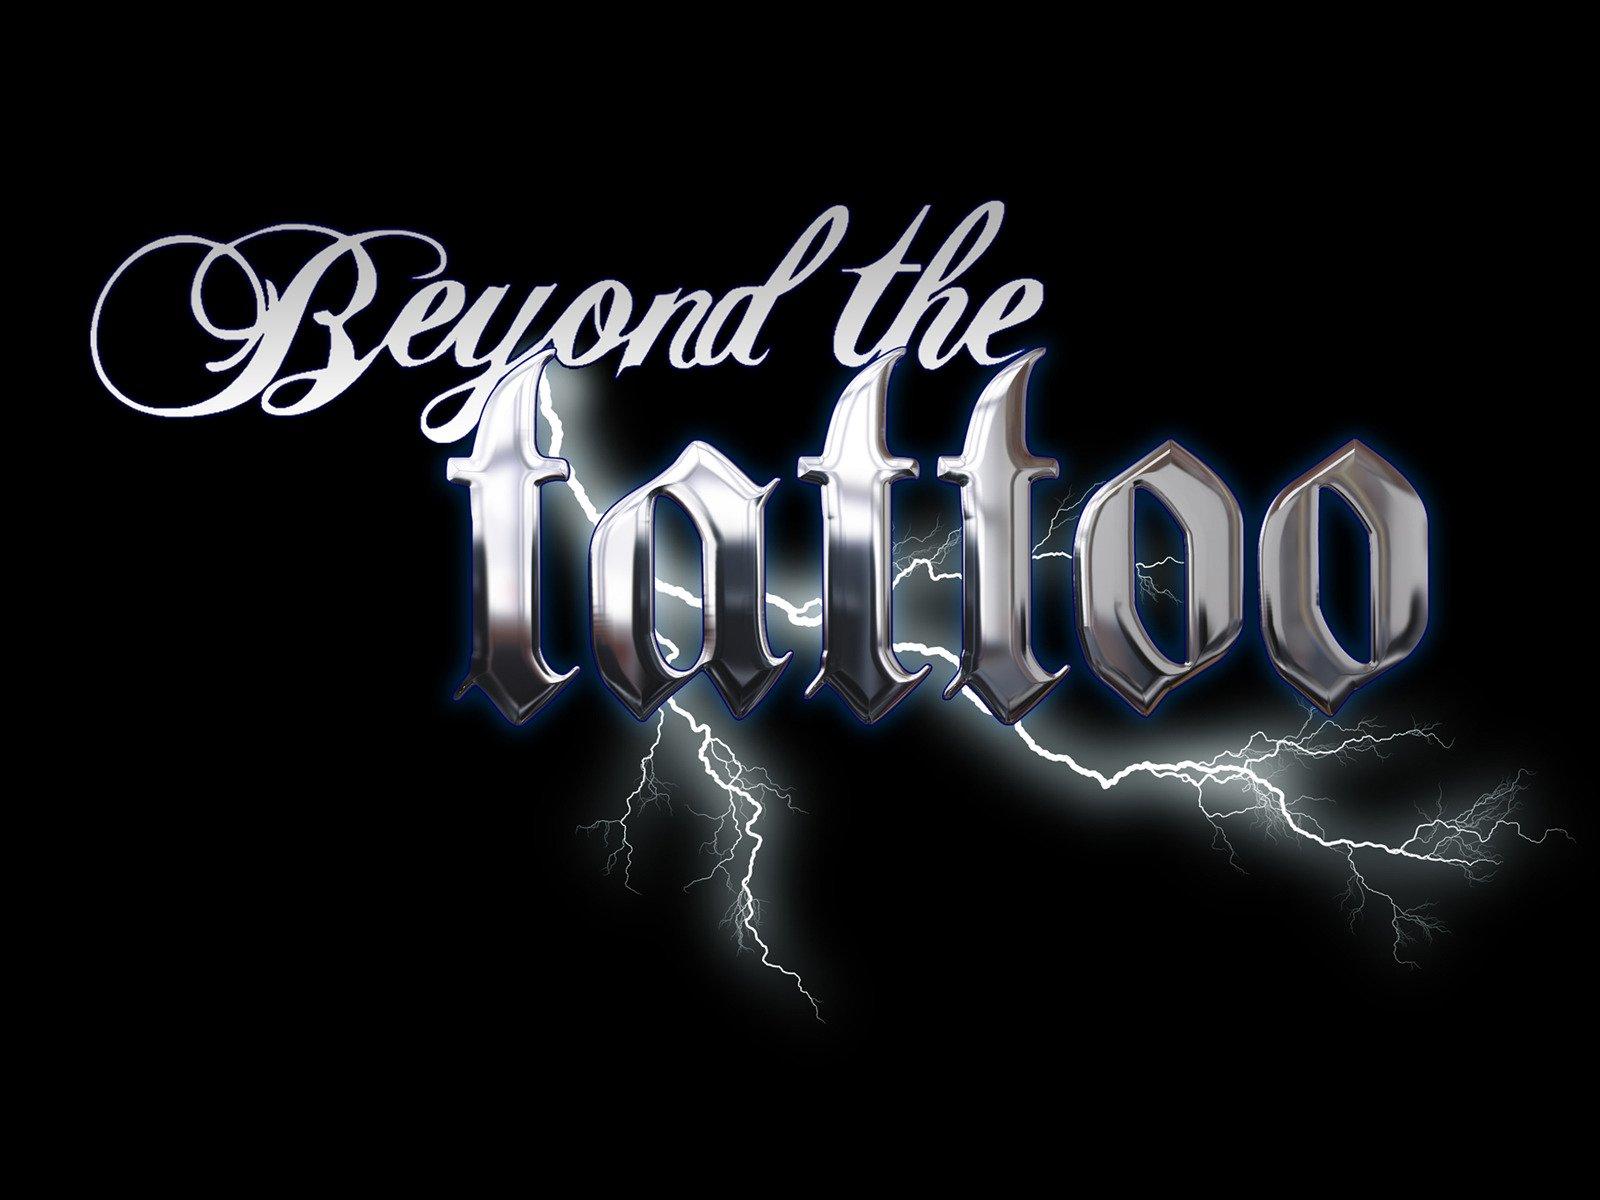 Beyond the Tattoo - Season 1